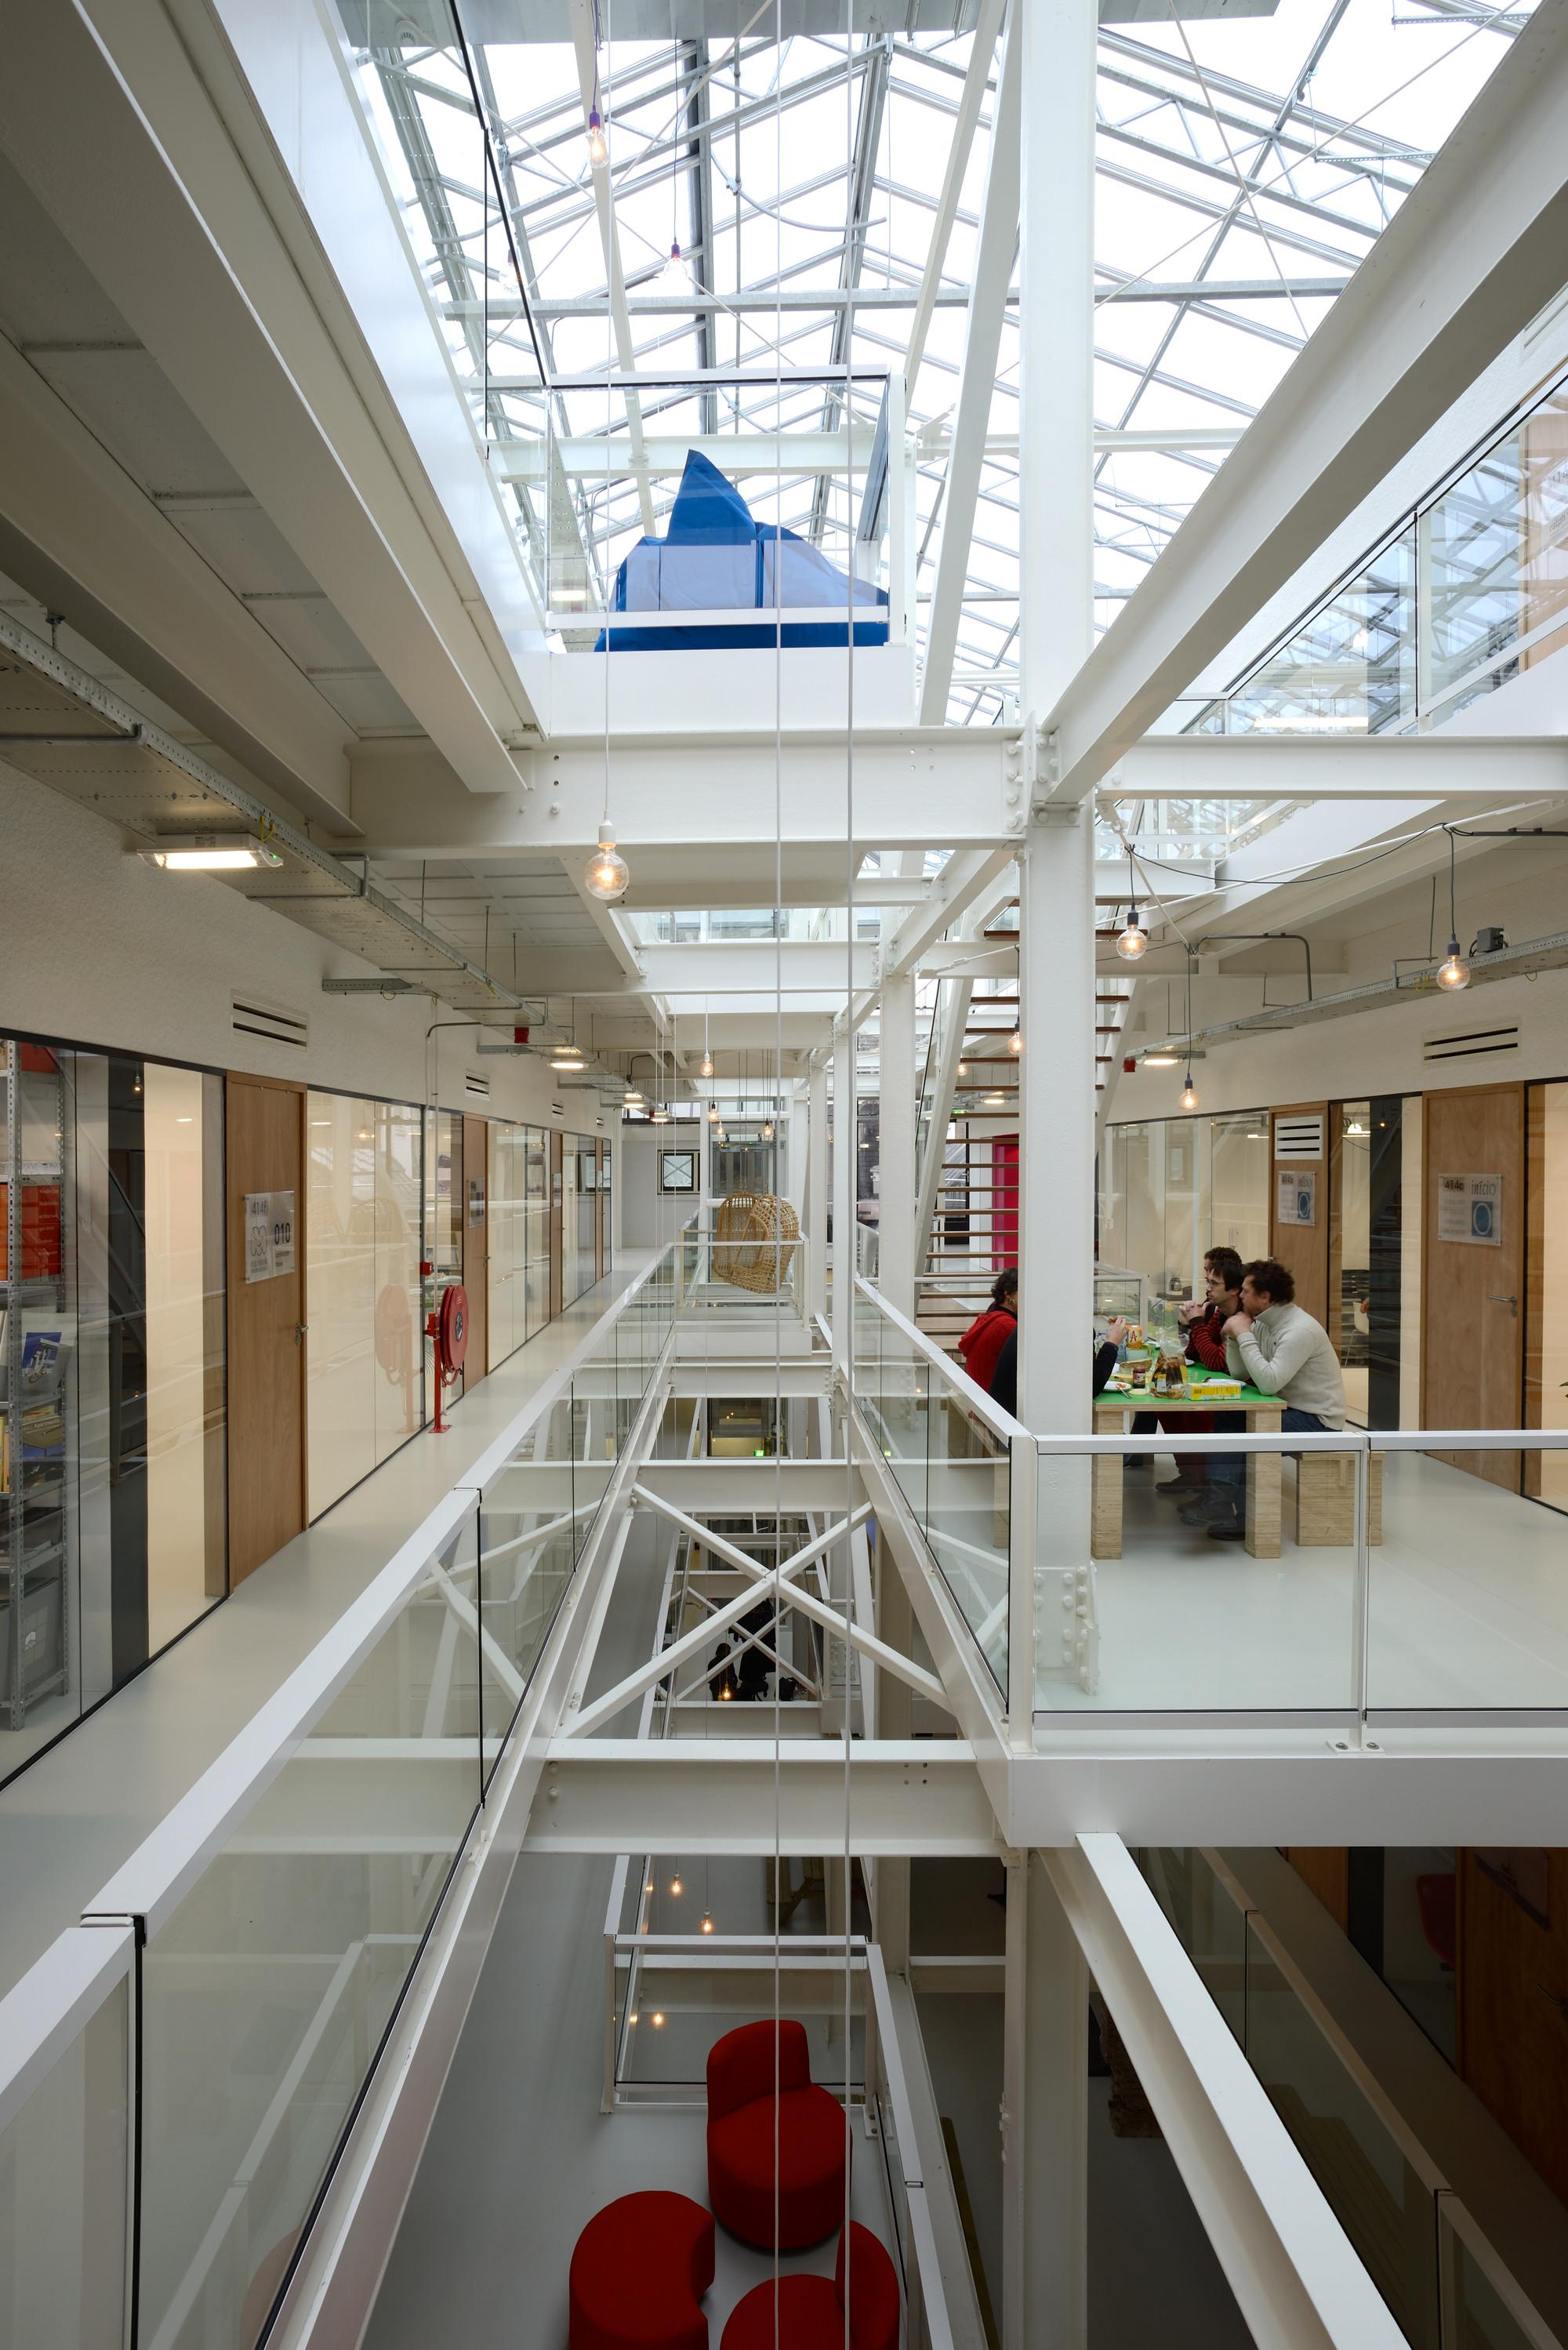 De fabriek in rotterdam mei architecten en stedenbouwers for Interieur software